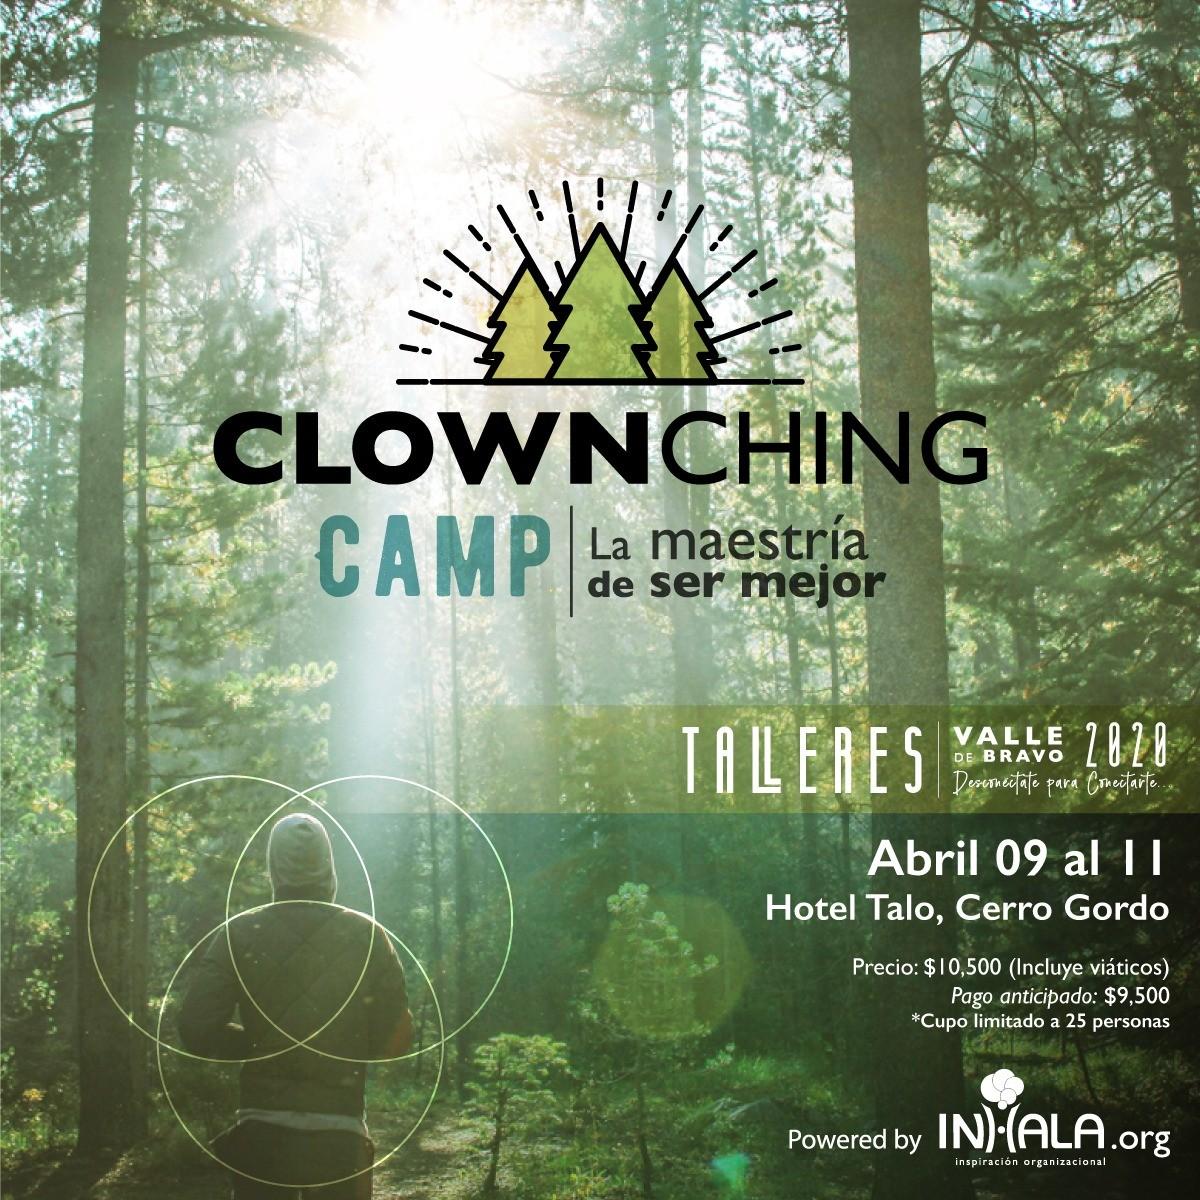 Clownching Camp